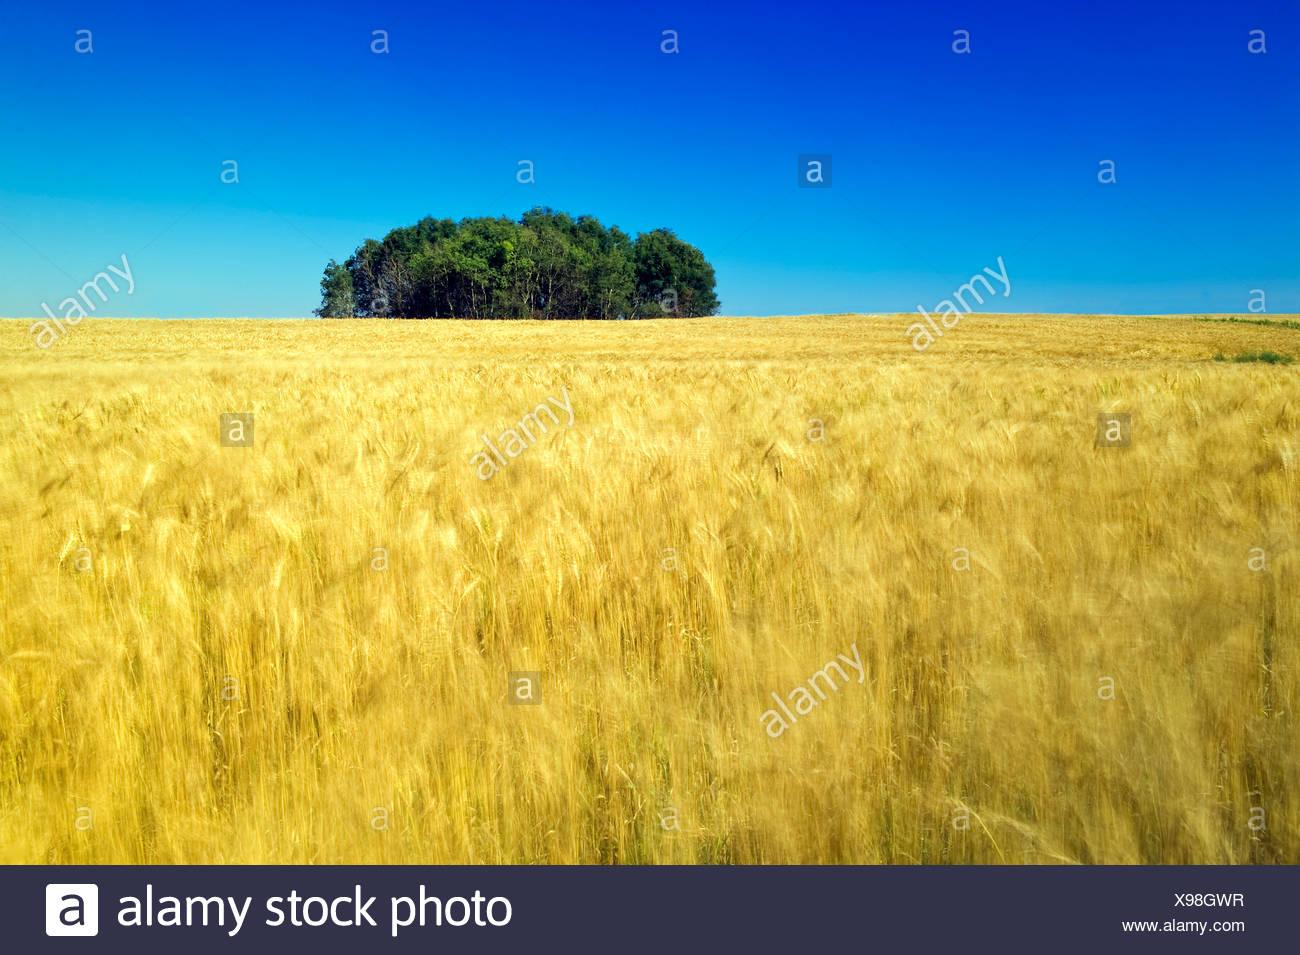 Grain field. Manor, Saskatchewan, Canada - Stock Image